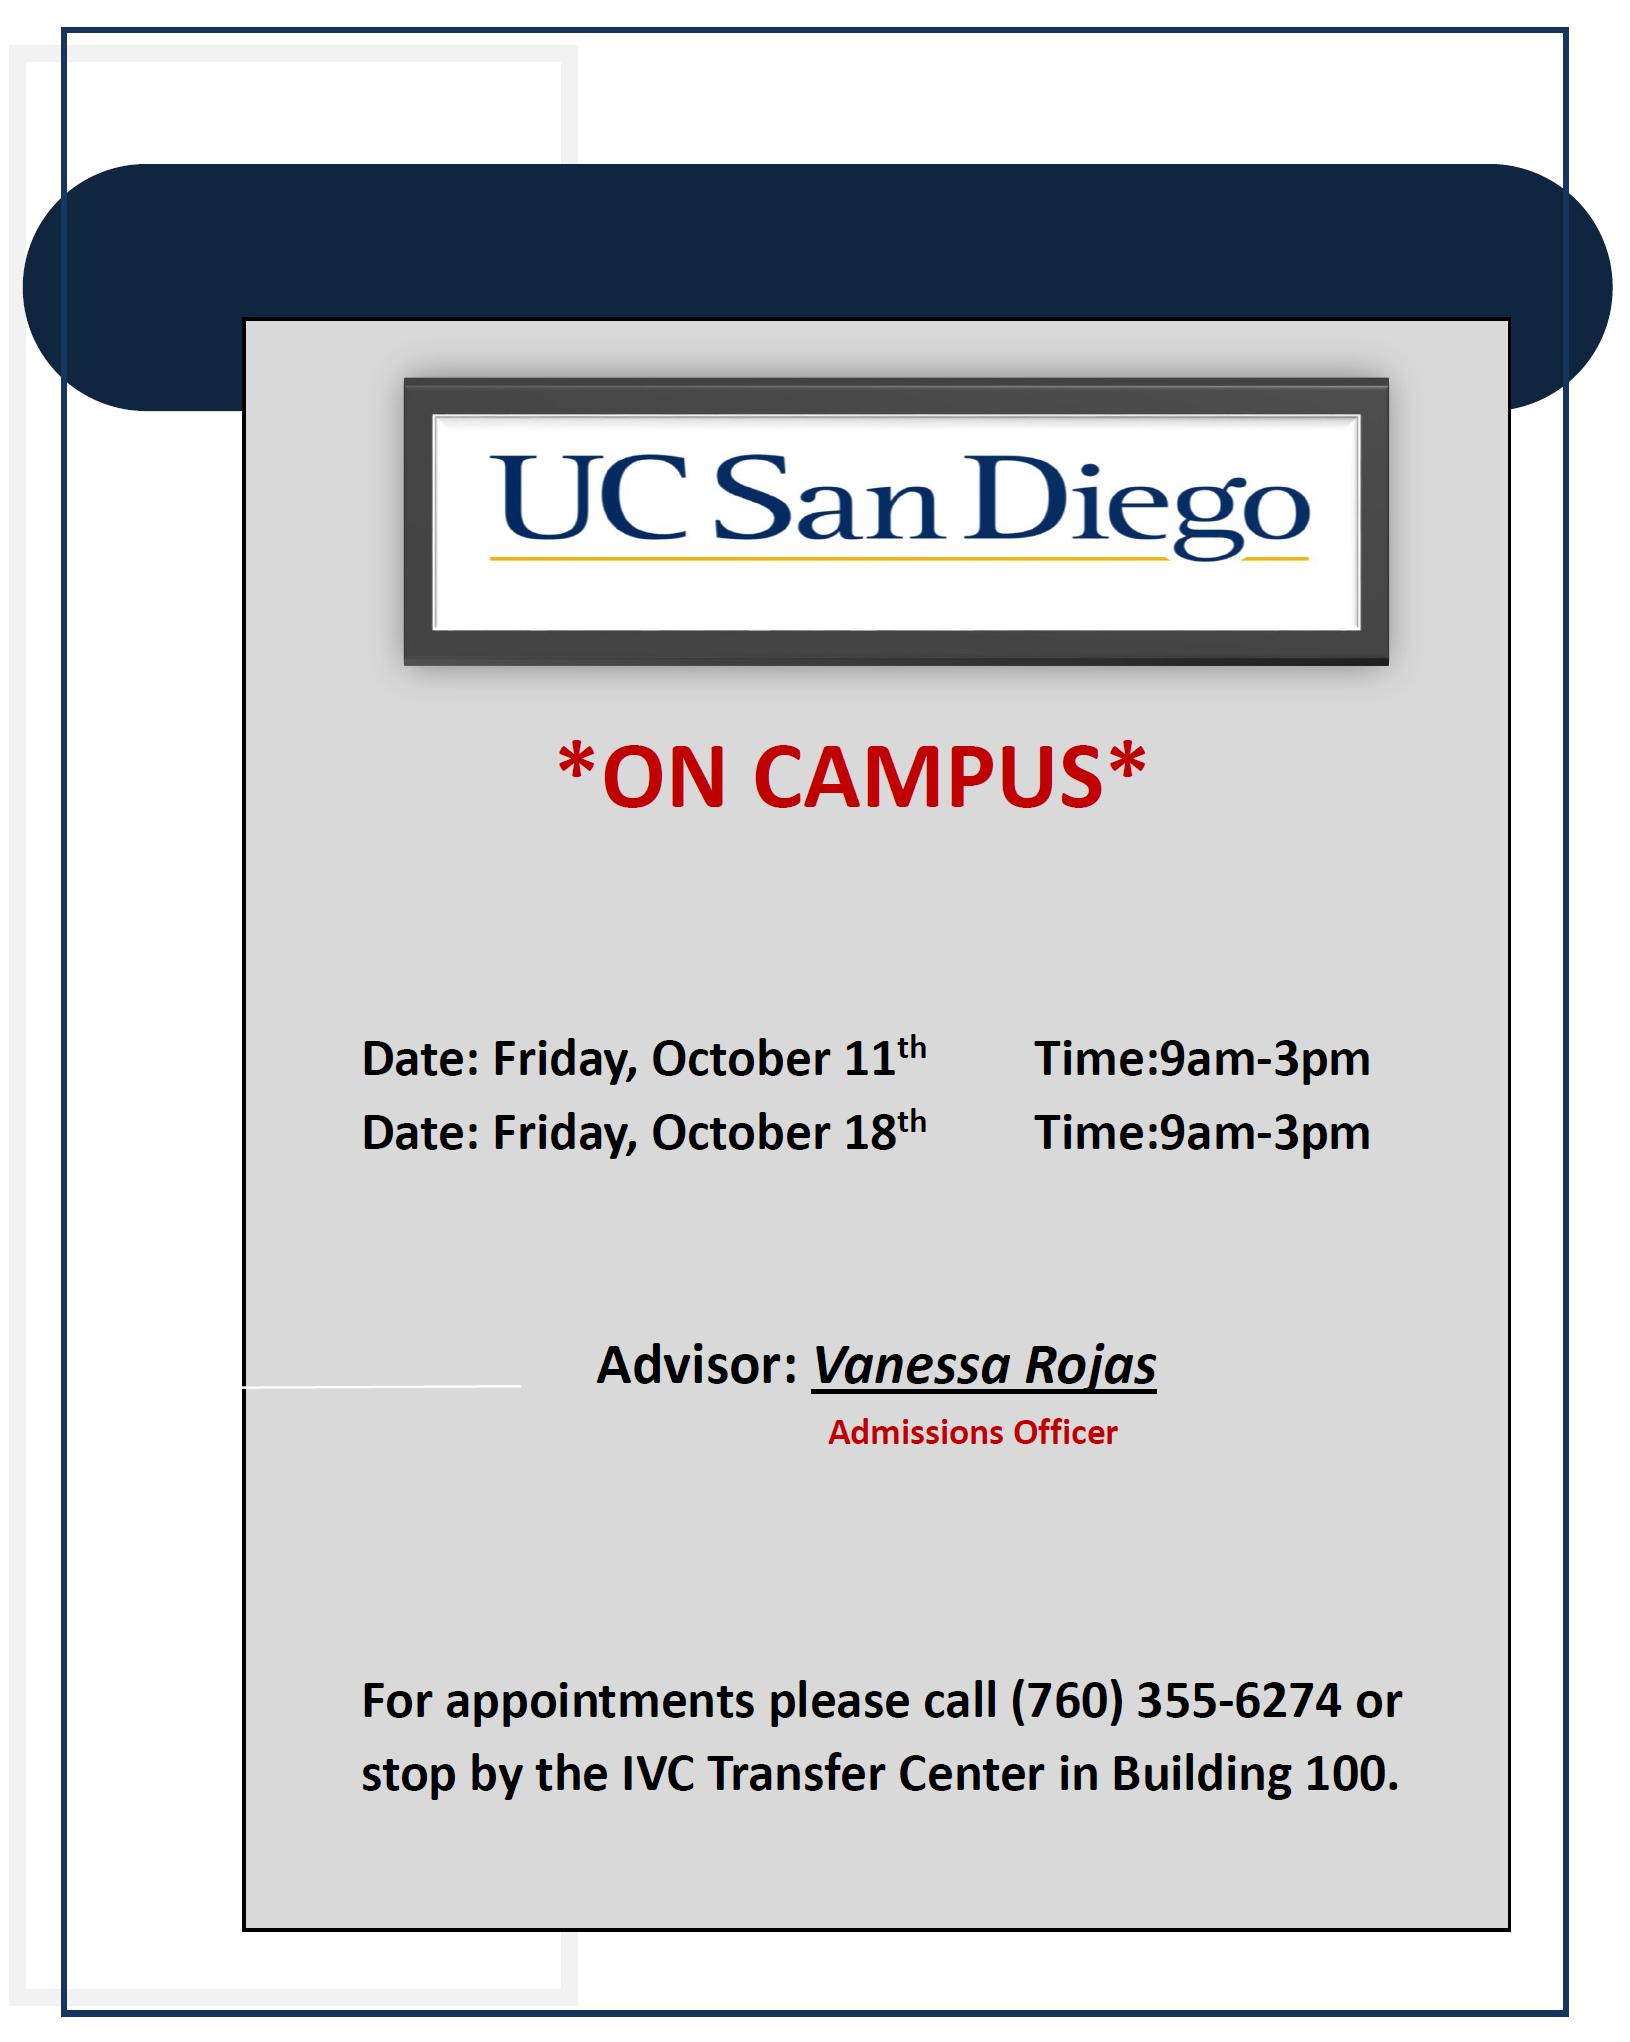 UCSD Flyer